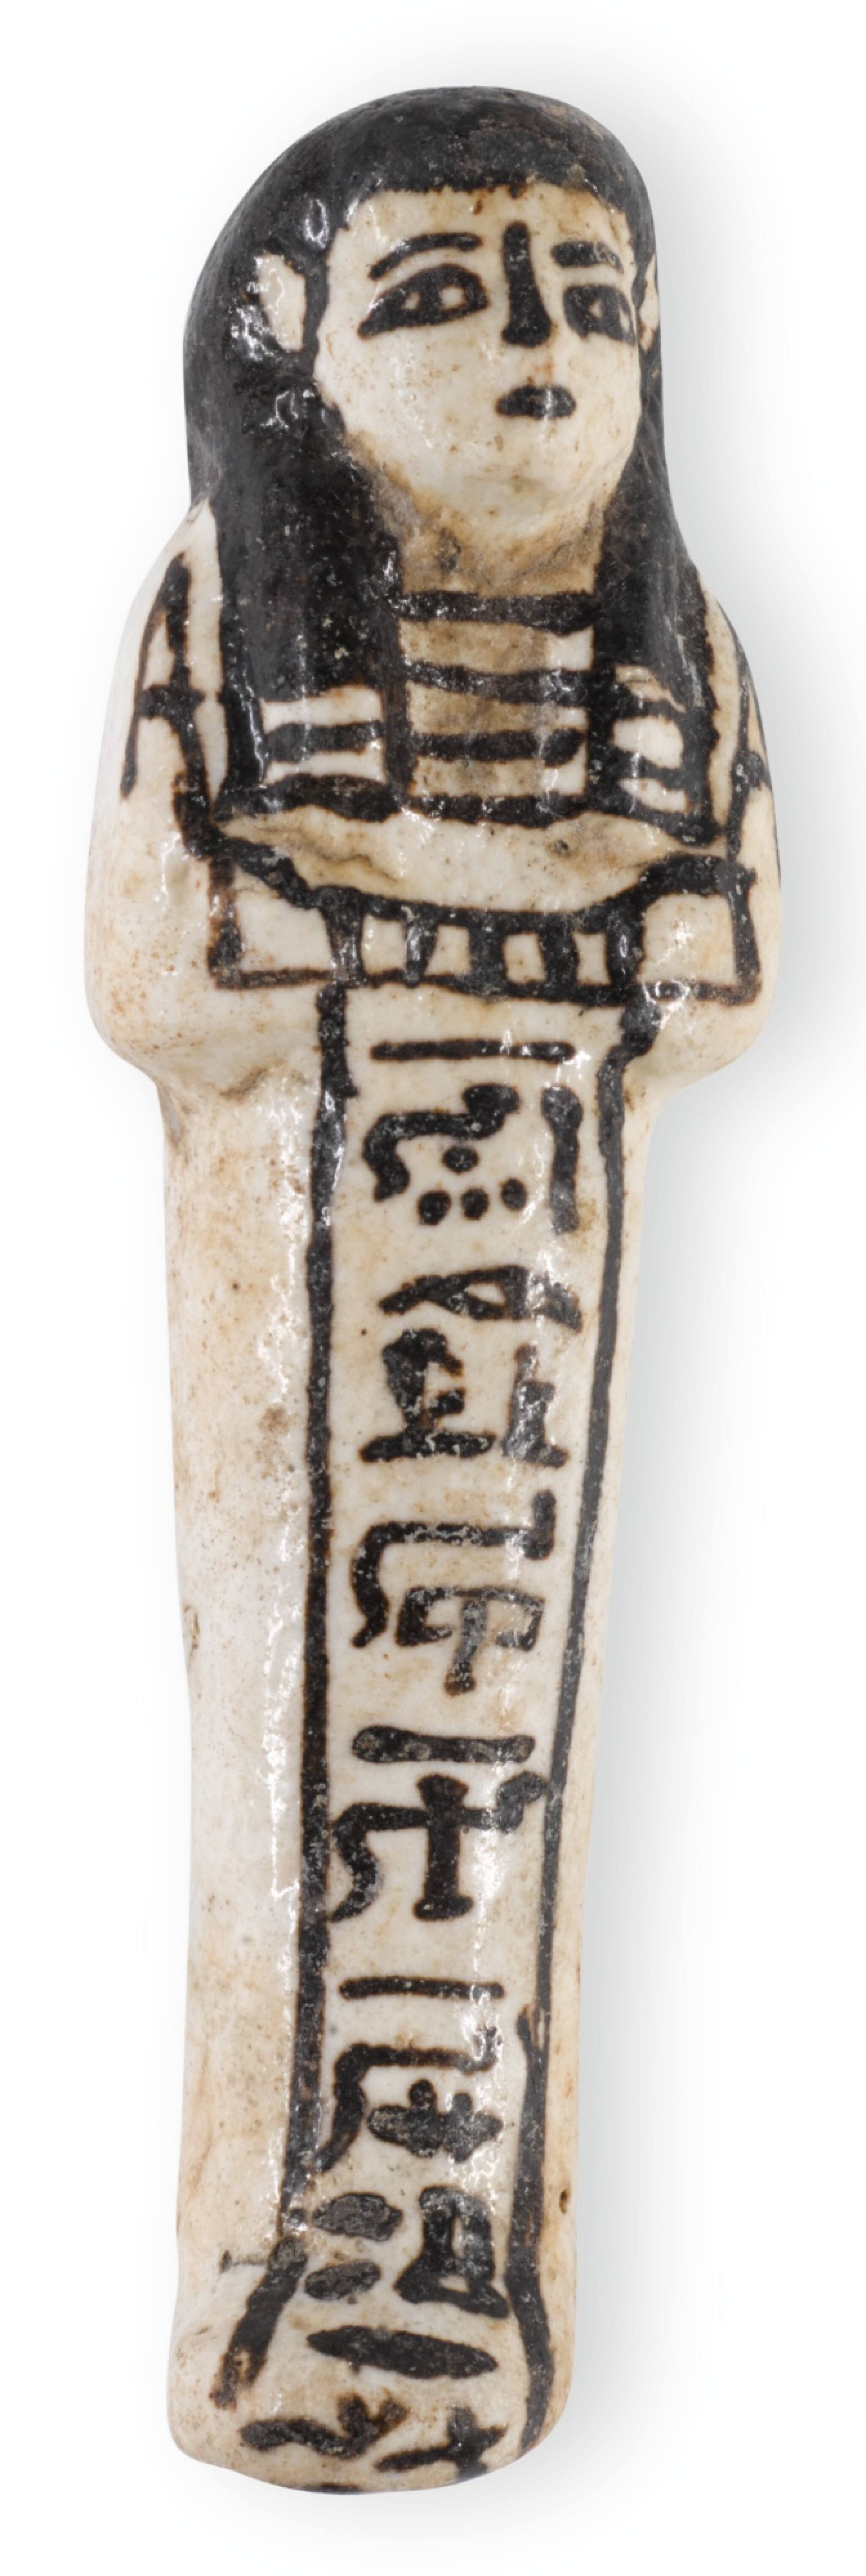 View 1 of Lot 177. AN EGYPTIAN GLAZED USHABTI, 19TH-20TH DYNASTY, CIRCA 1292-1075 B.C..